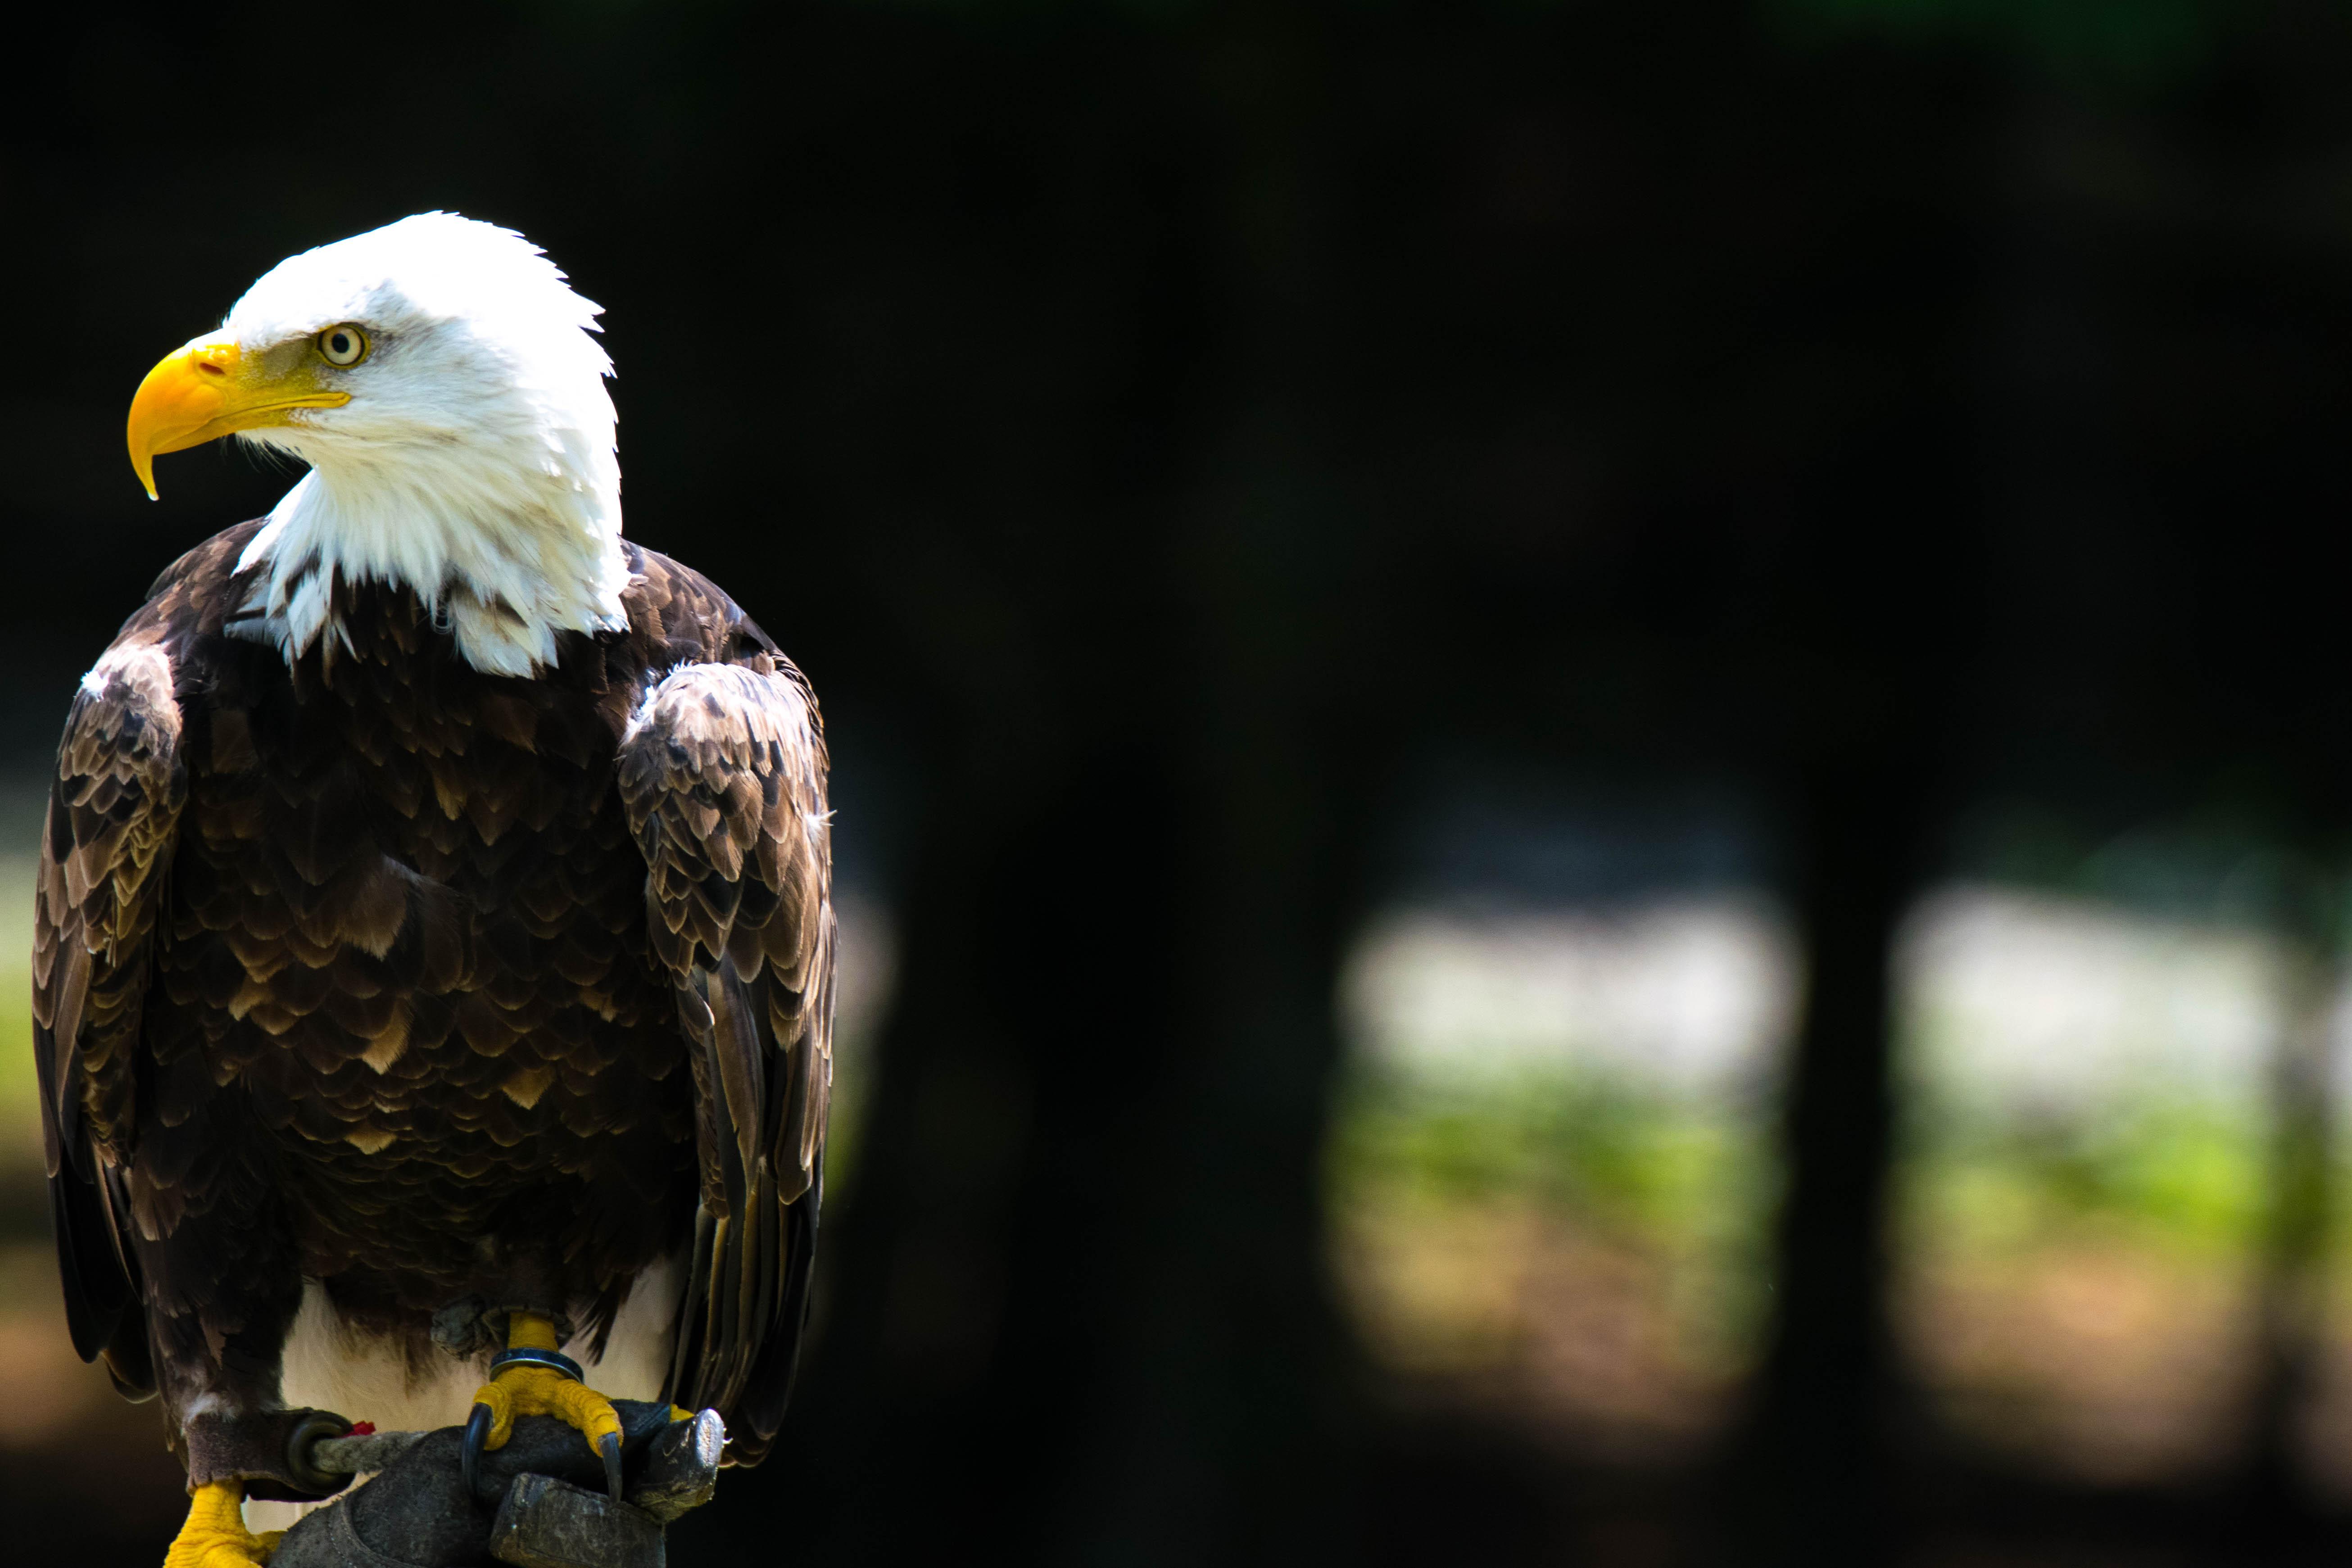 Bald Eagle sitting on a branch at Parc Omega